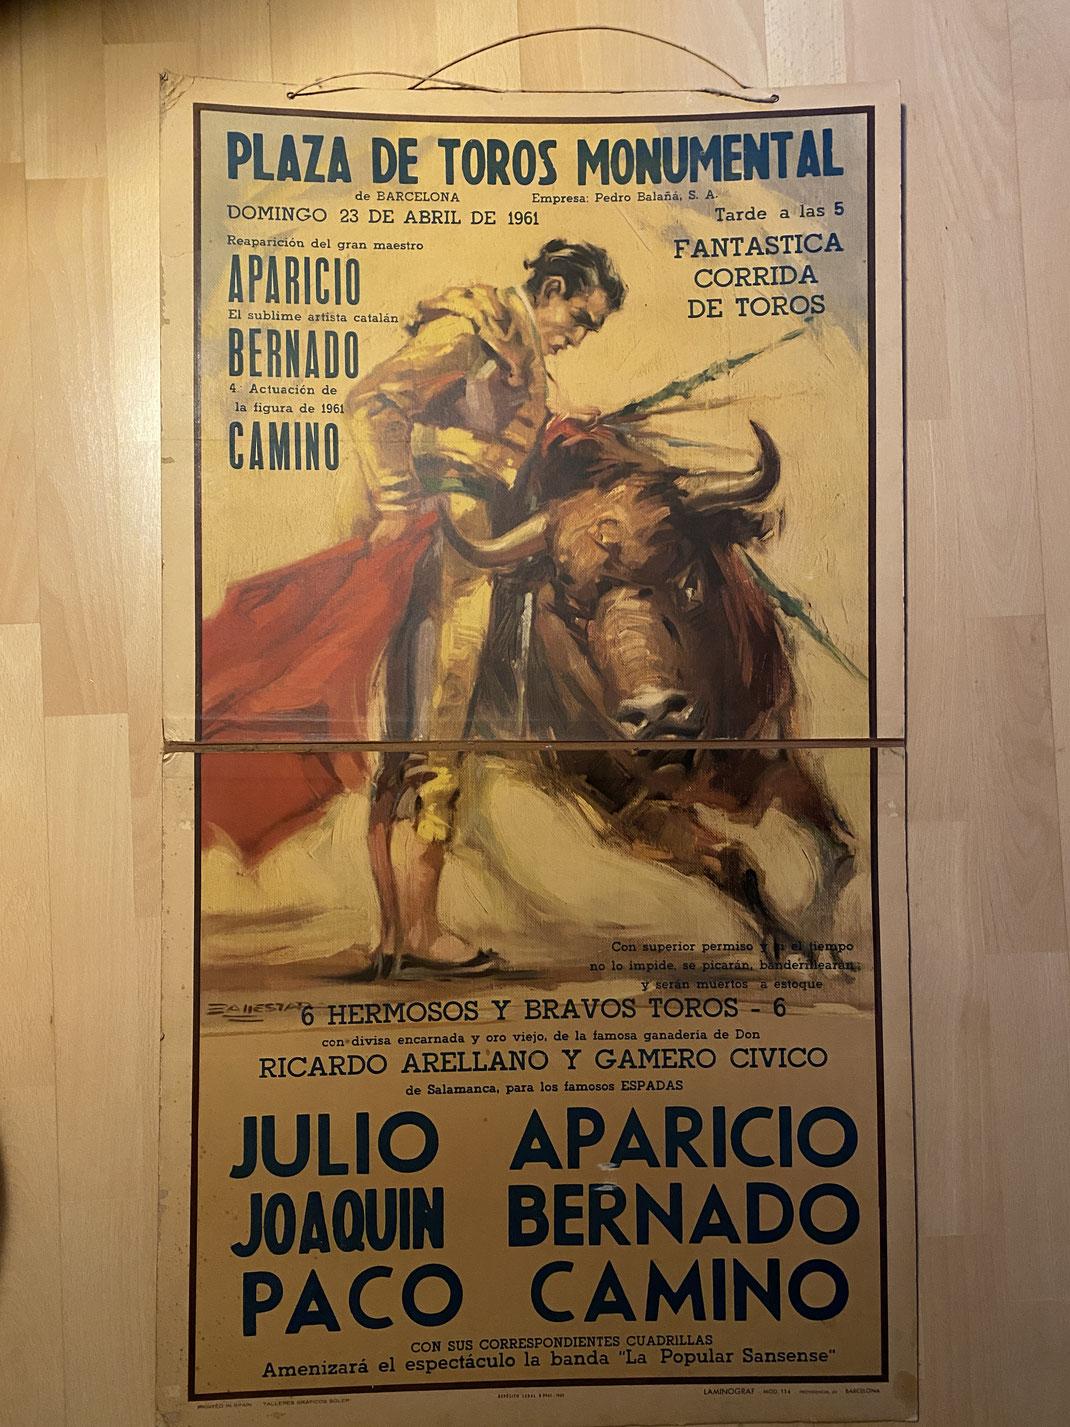 Original Stierkampfplakat / Bullfight Poster ( kein Nachdruck ) Plaza de Toros Monumental de Barcelona Fantastica Corrida de Toros Domingo de 23 Abril de 1961 Aparaicio, Bernado, Camino